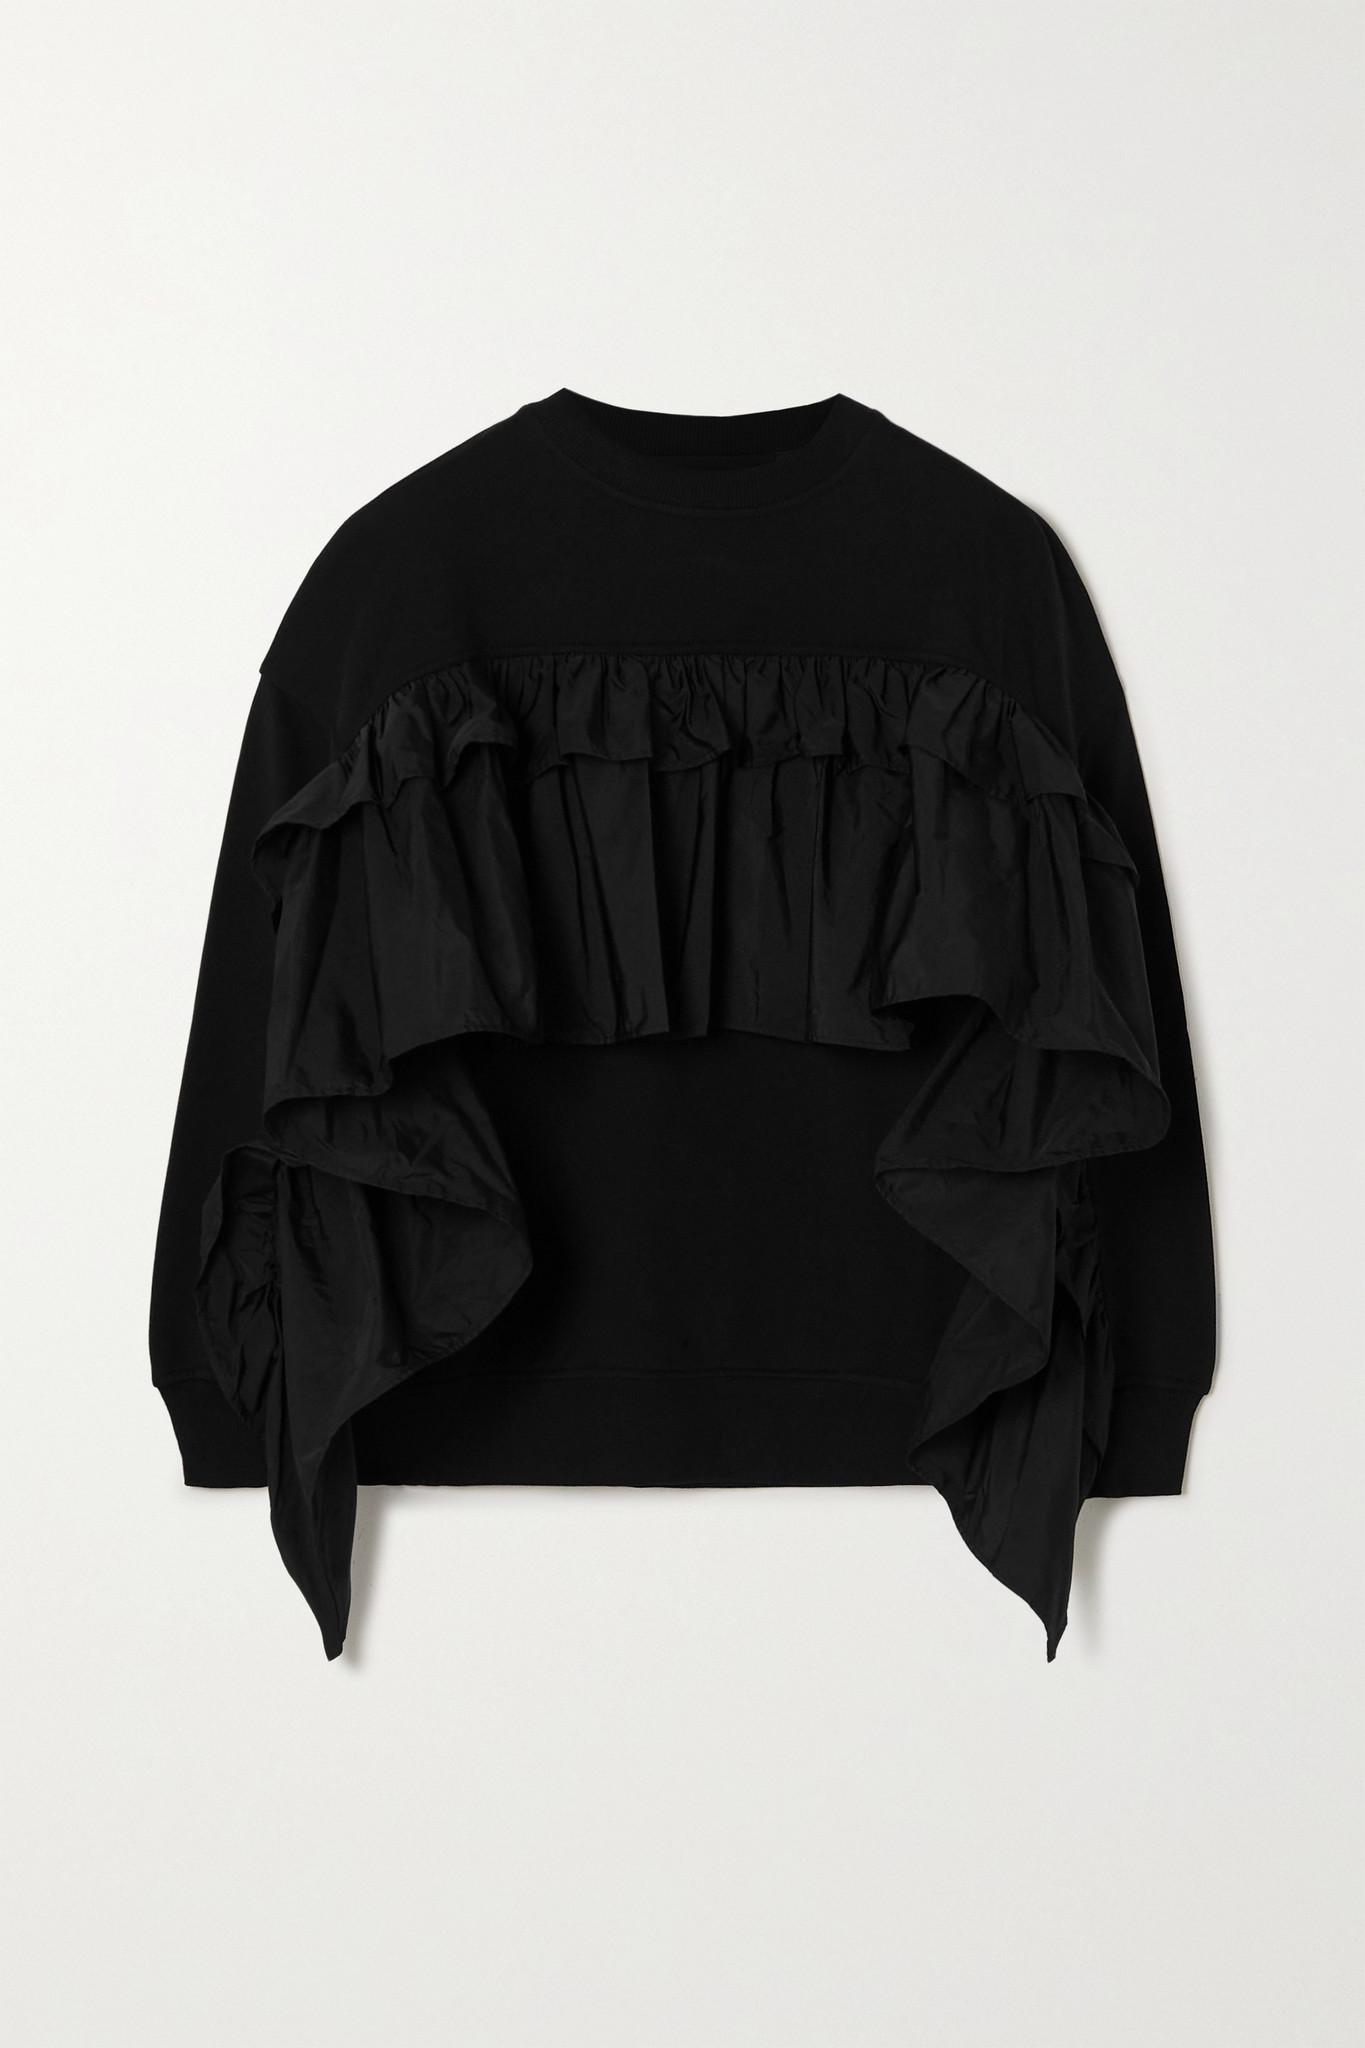 REDVALENTINO - 荷叶边塔夫绸边饰棉质混纺平纹布卫衣 - 黑色 - medium